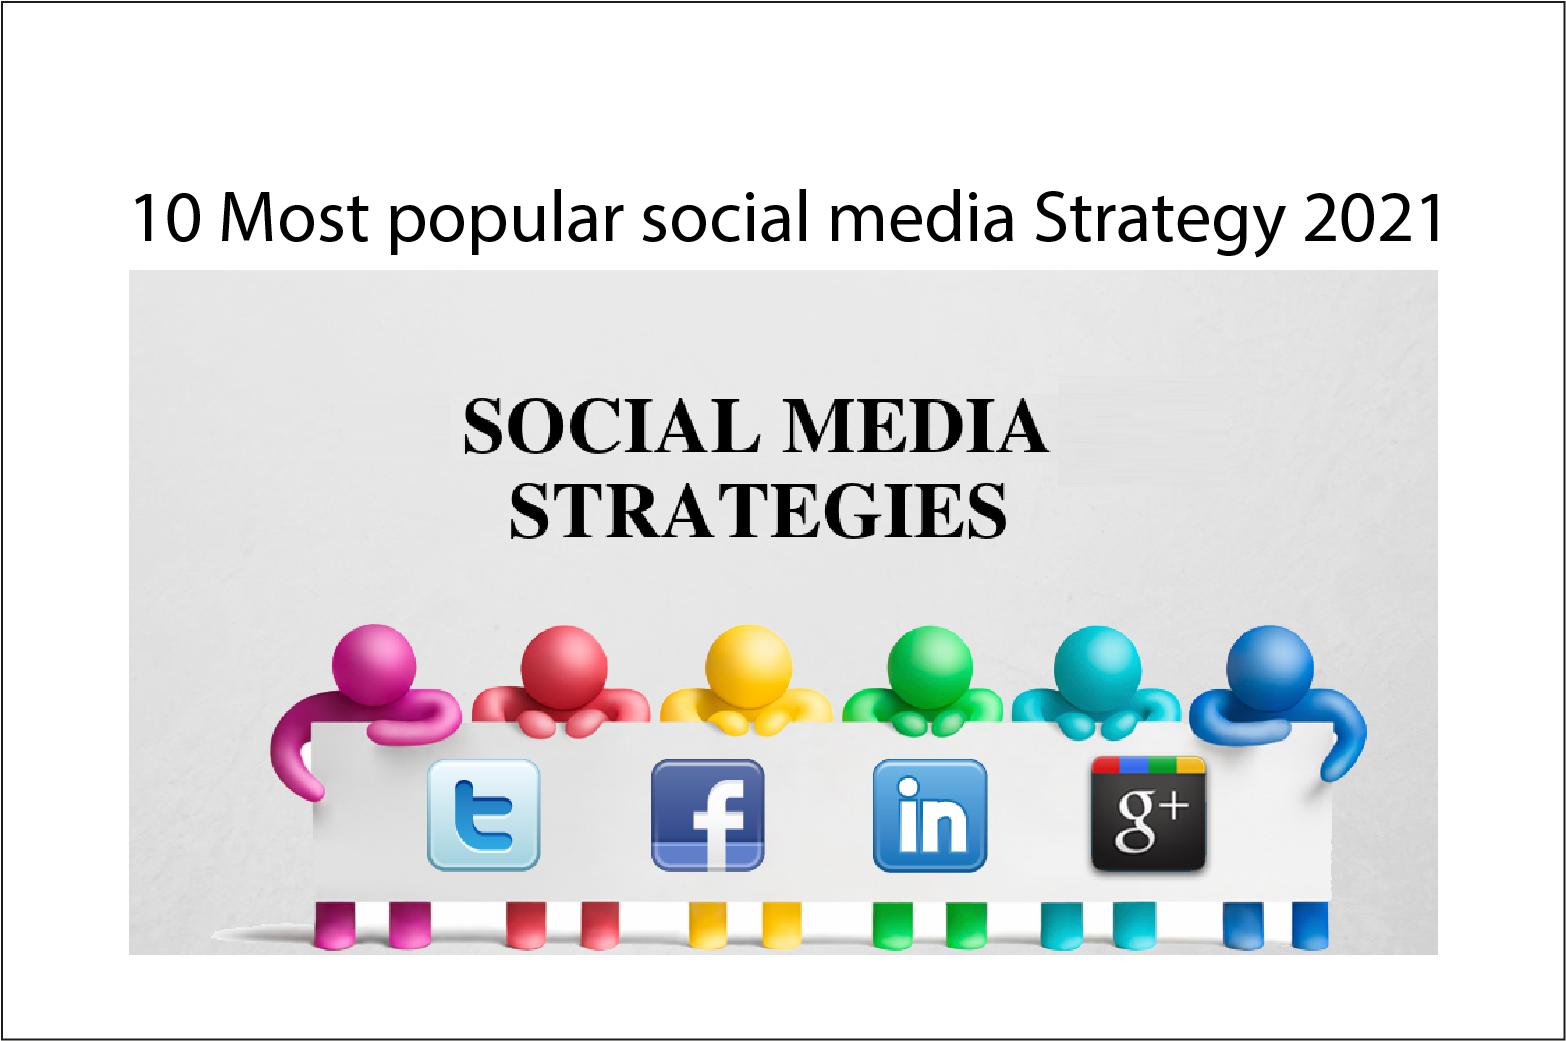 Most Popular Social Media Strategy 2021